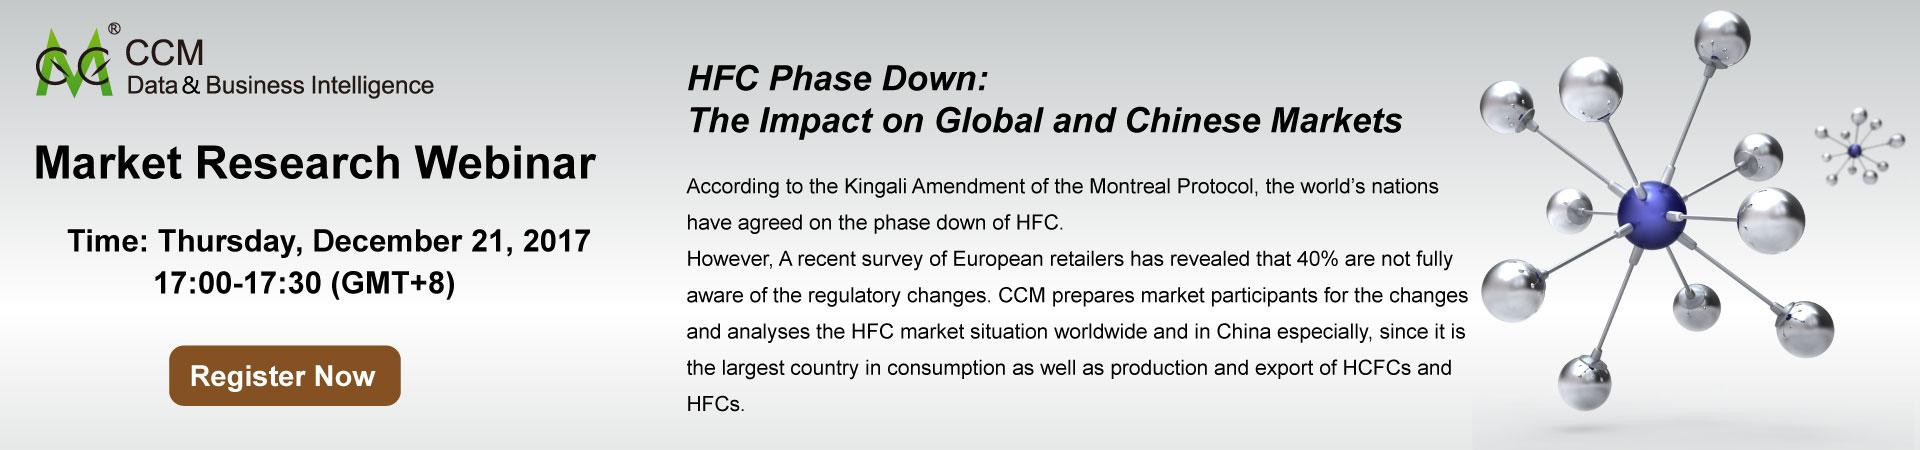 HFC China Webinar Market Research